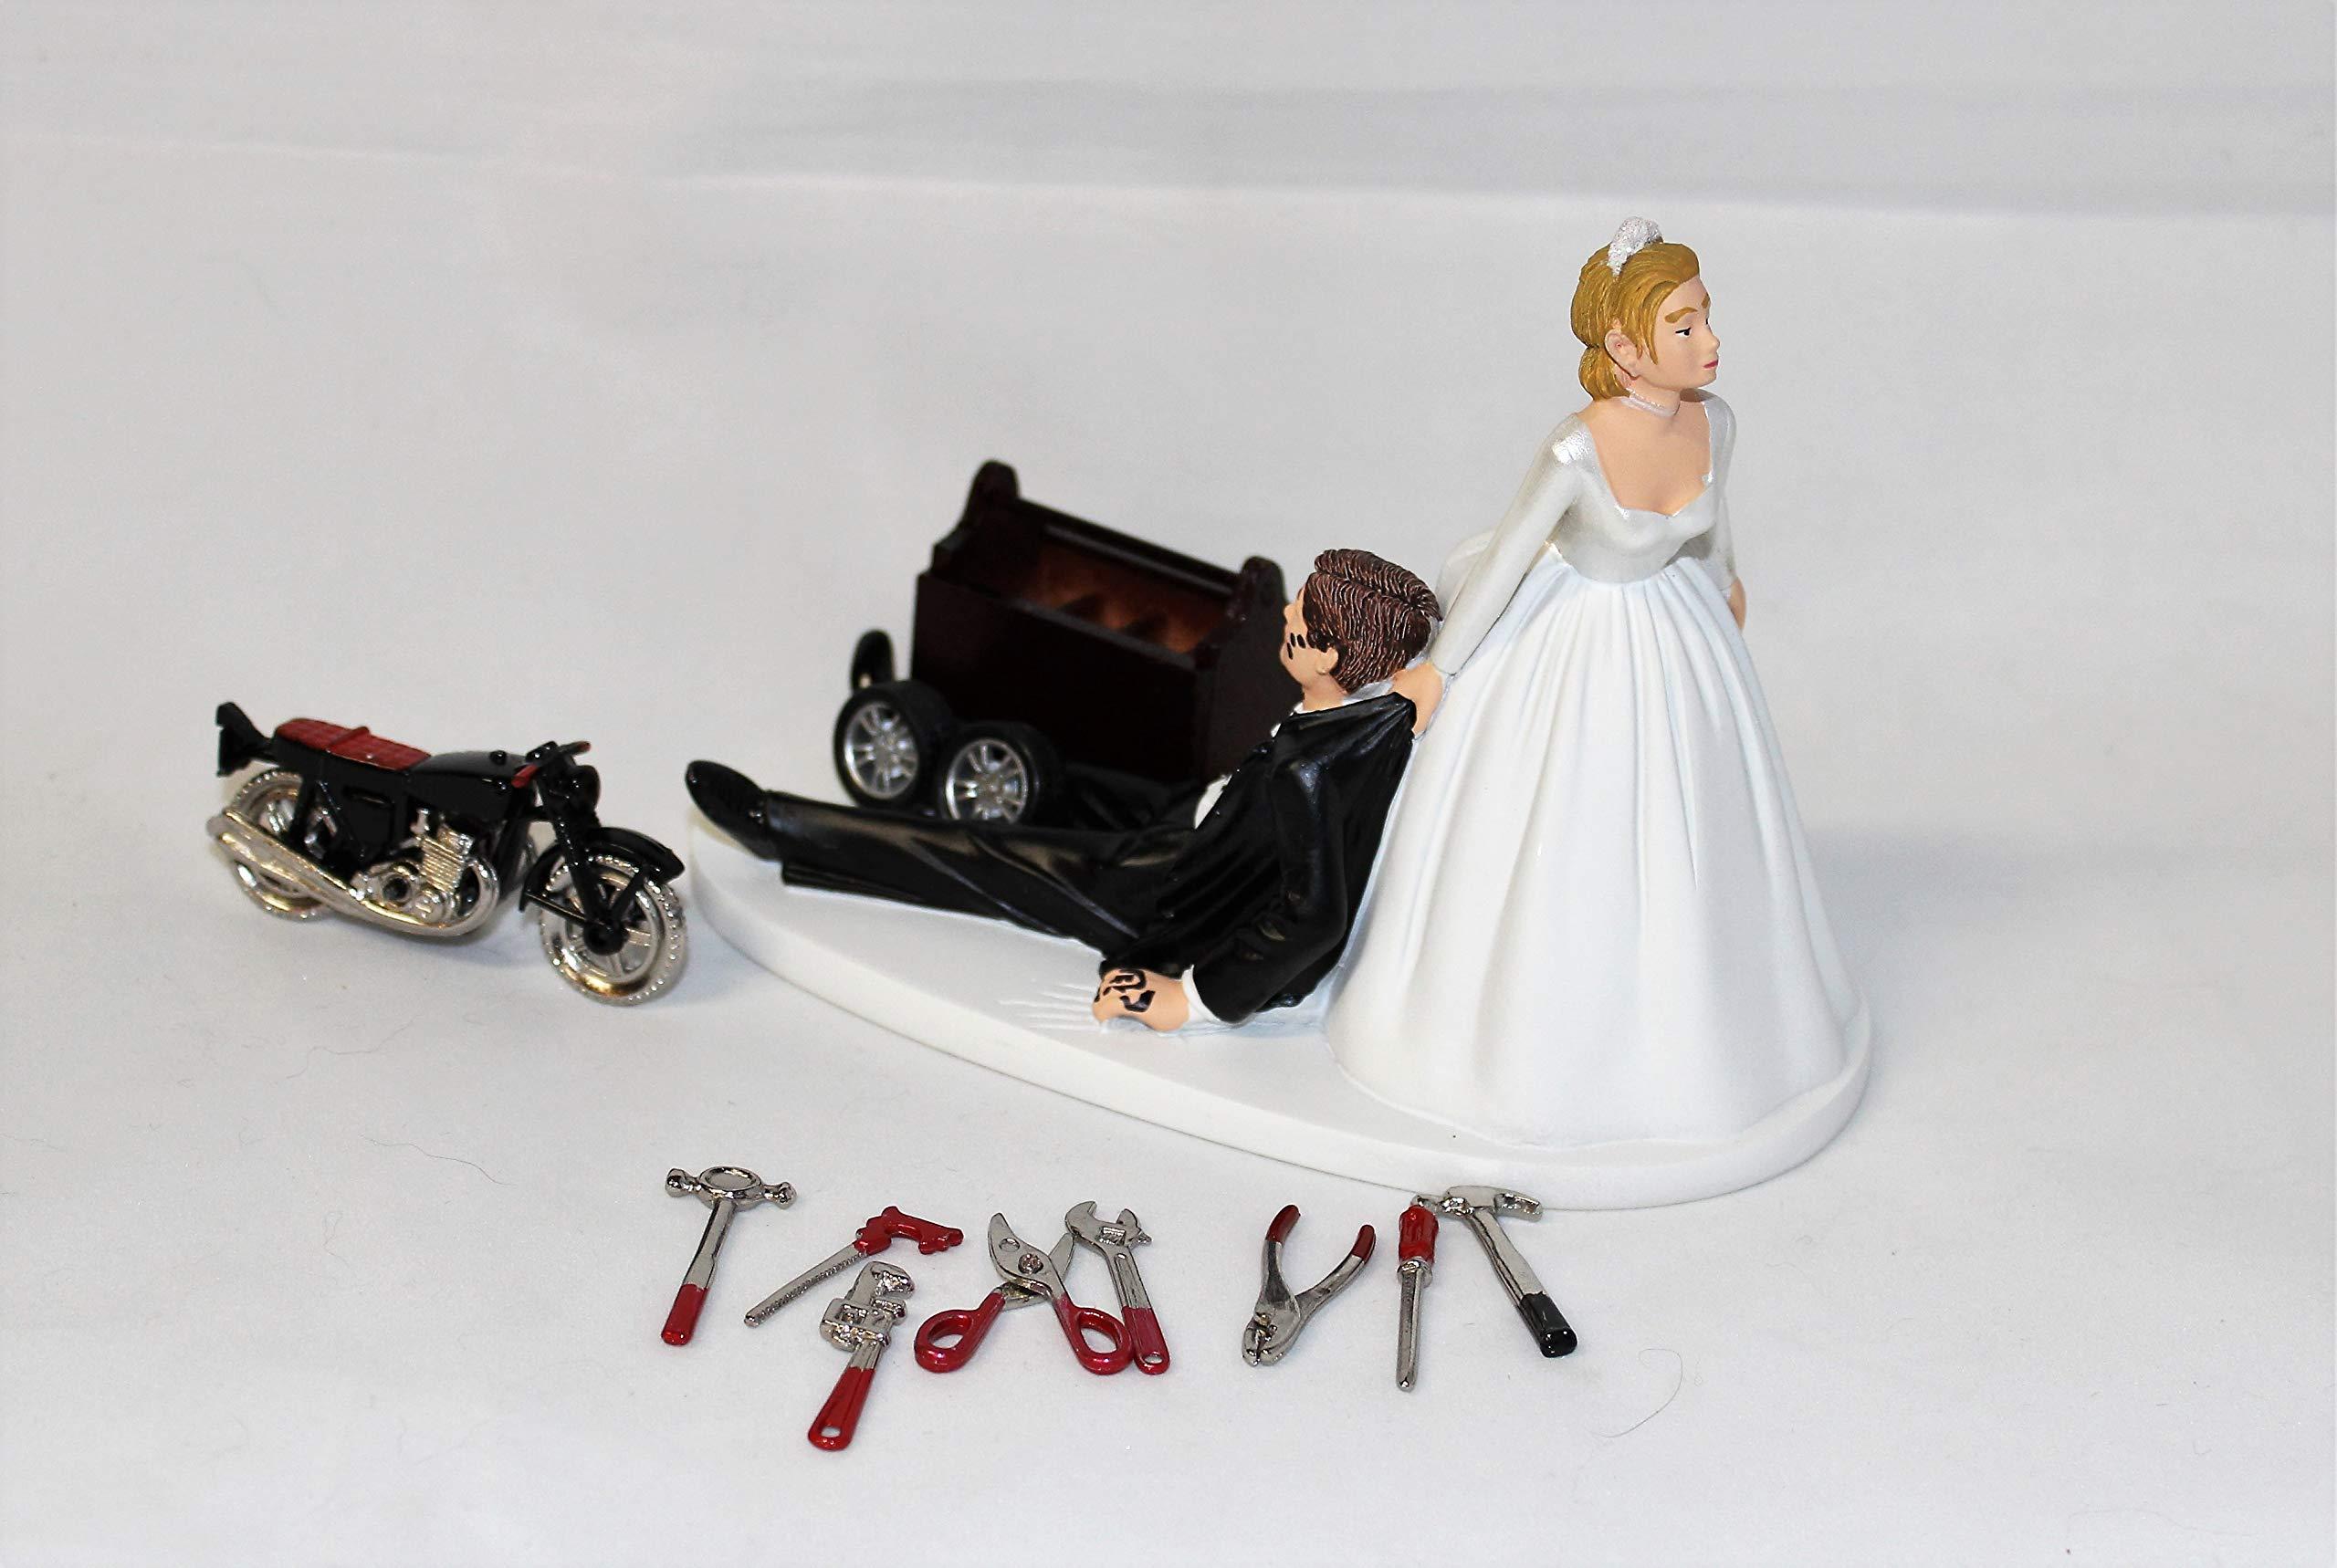 Wedding Motorcycle Biker Garage Mechanic grease Cake Topper by Custom Design Wedding Supplies by Suzanne (Image #3)